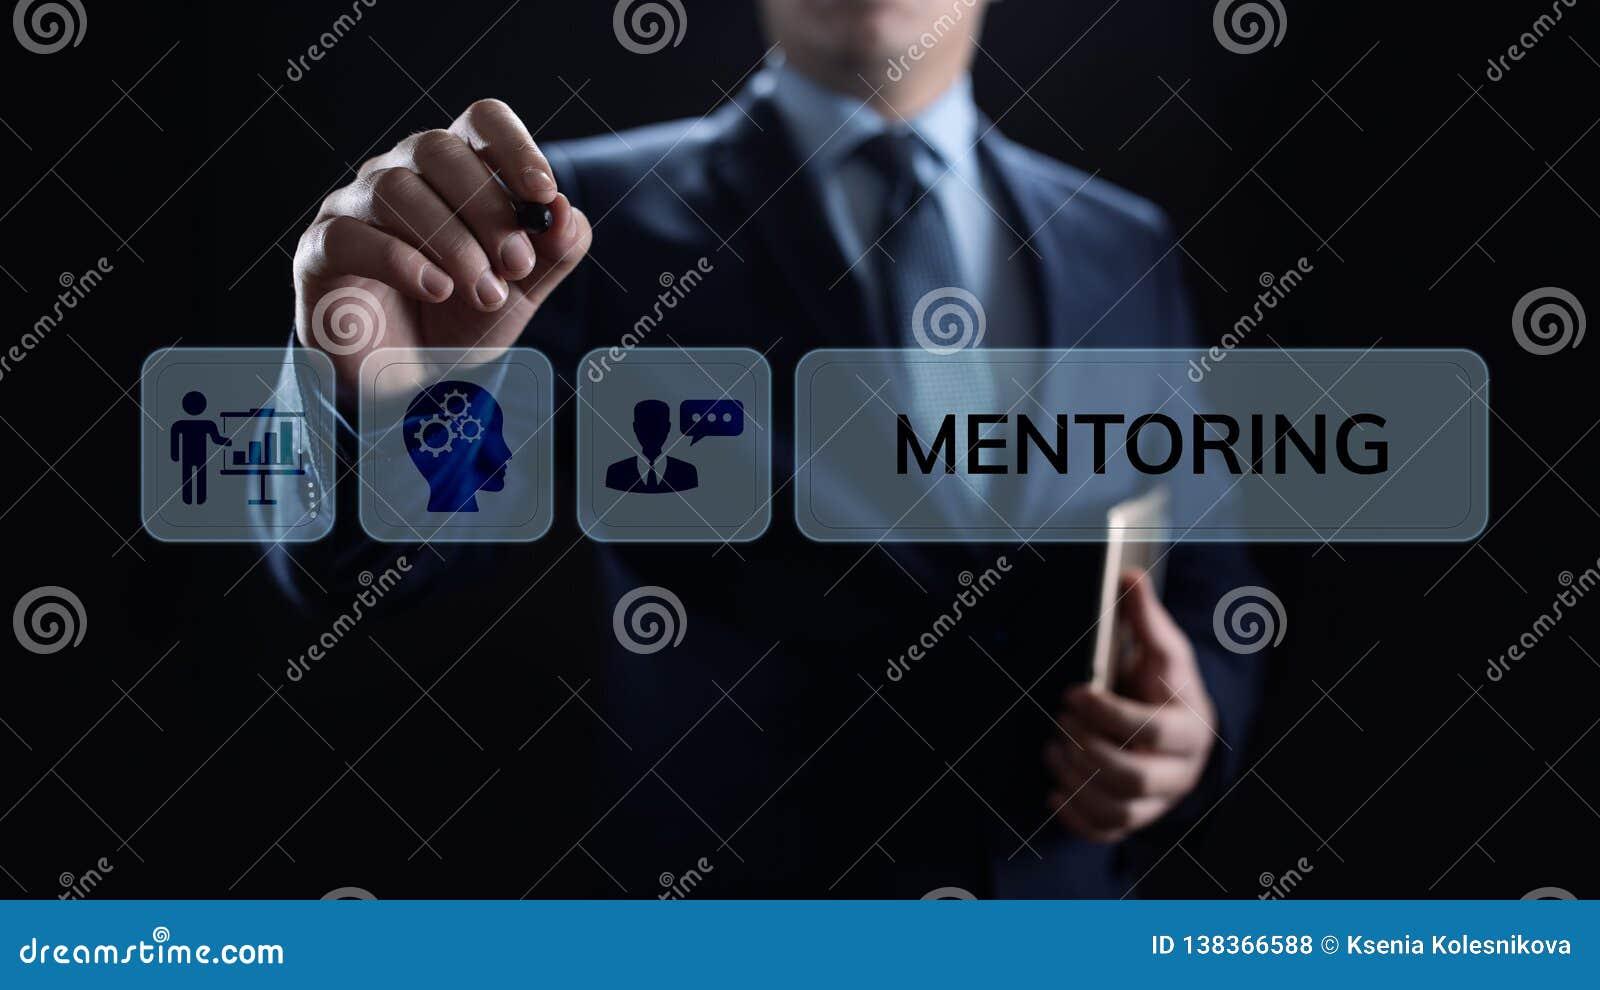 Mentoring ανάπτυξη κατάρτισης προγύμνασης προσωπικές και έννοια εκπαίδευσης